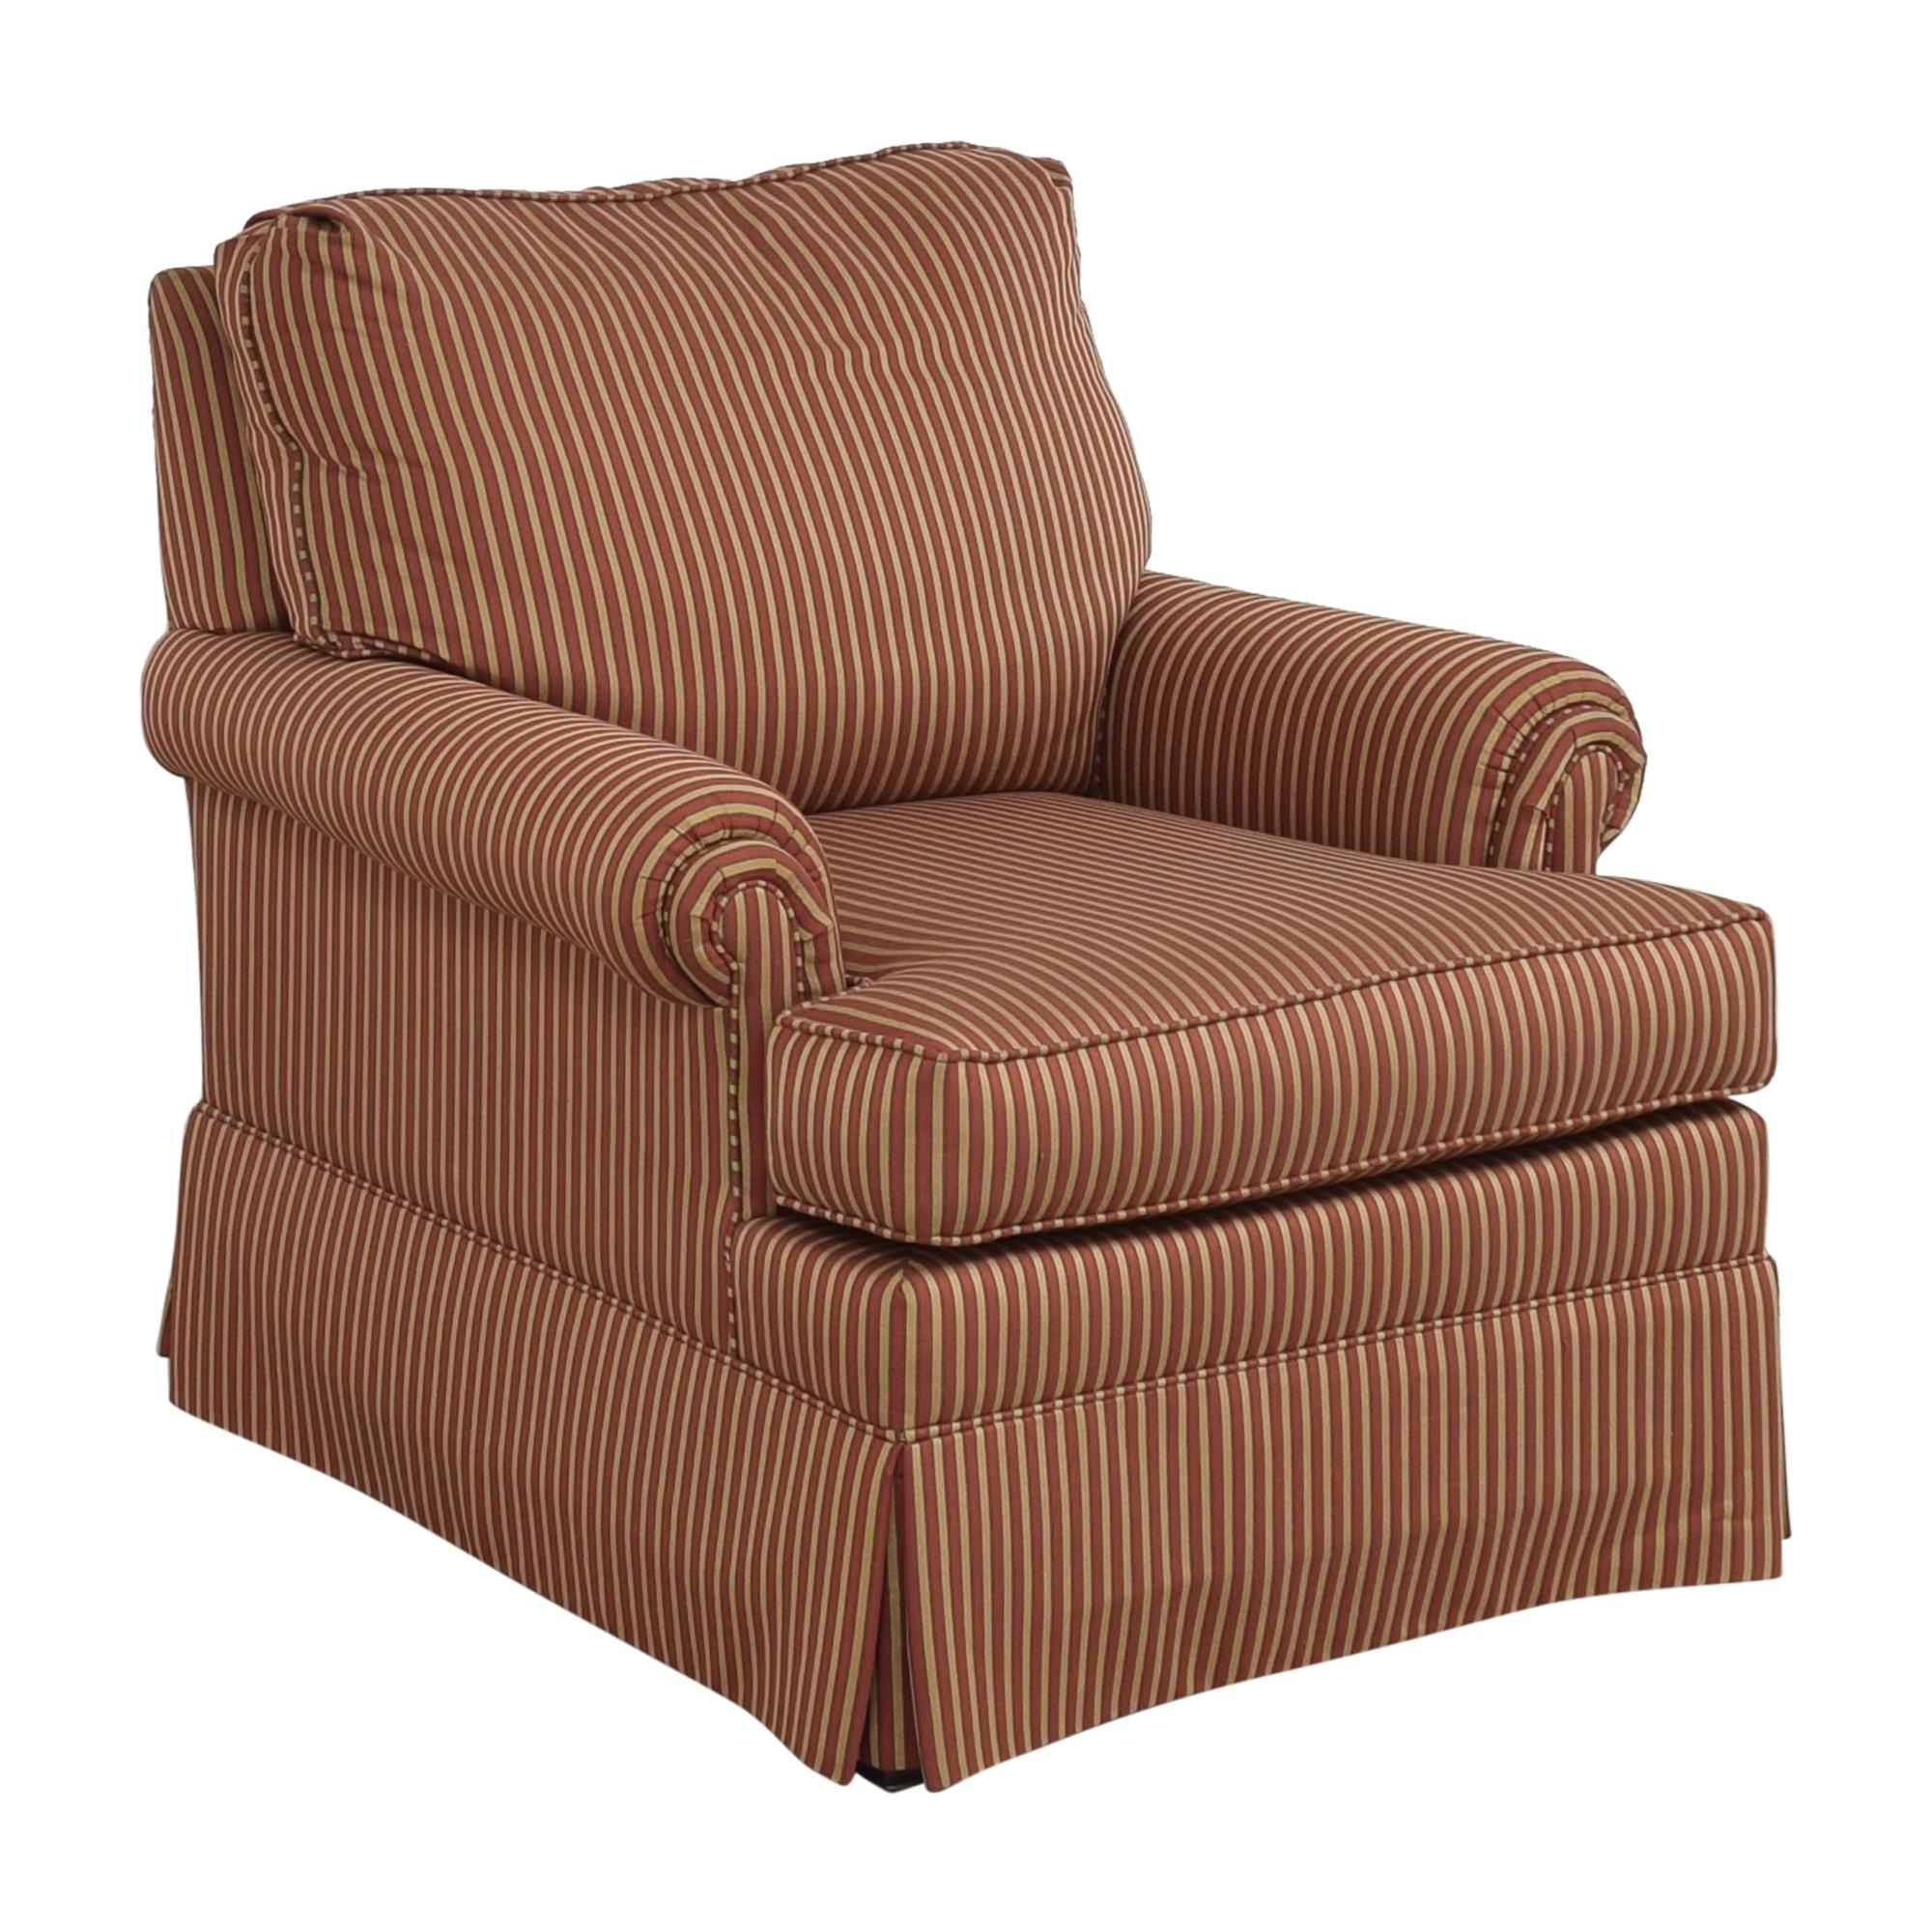 Ethan Allen Mr. Chair / Chairs